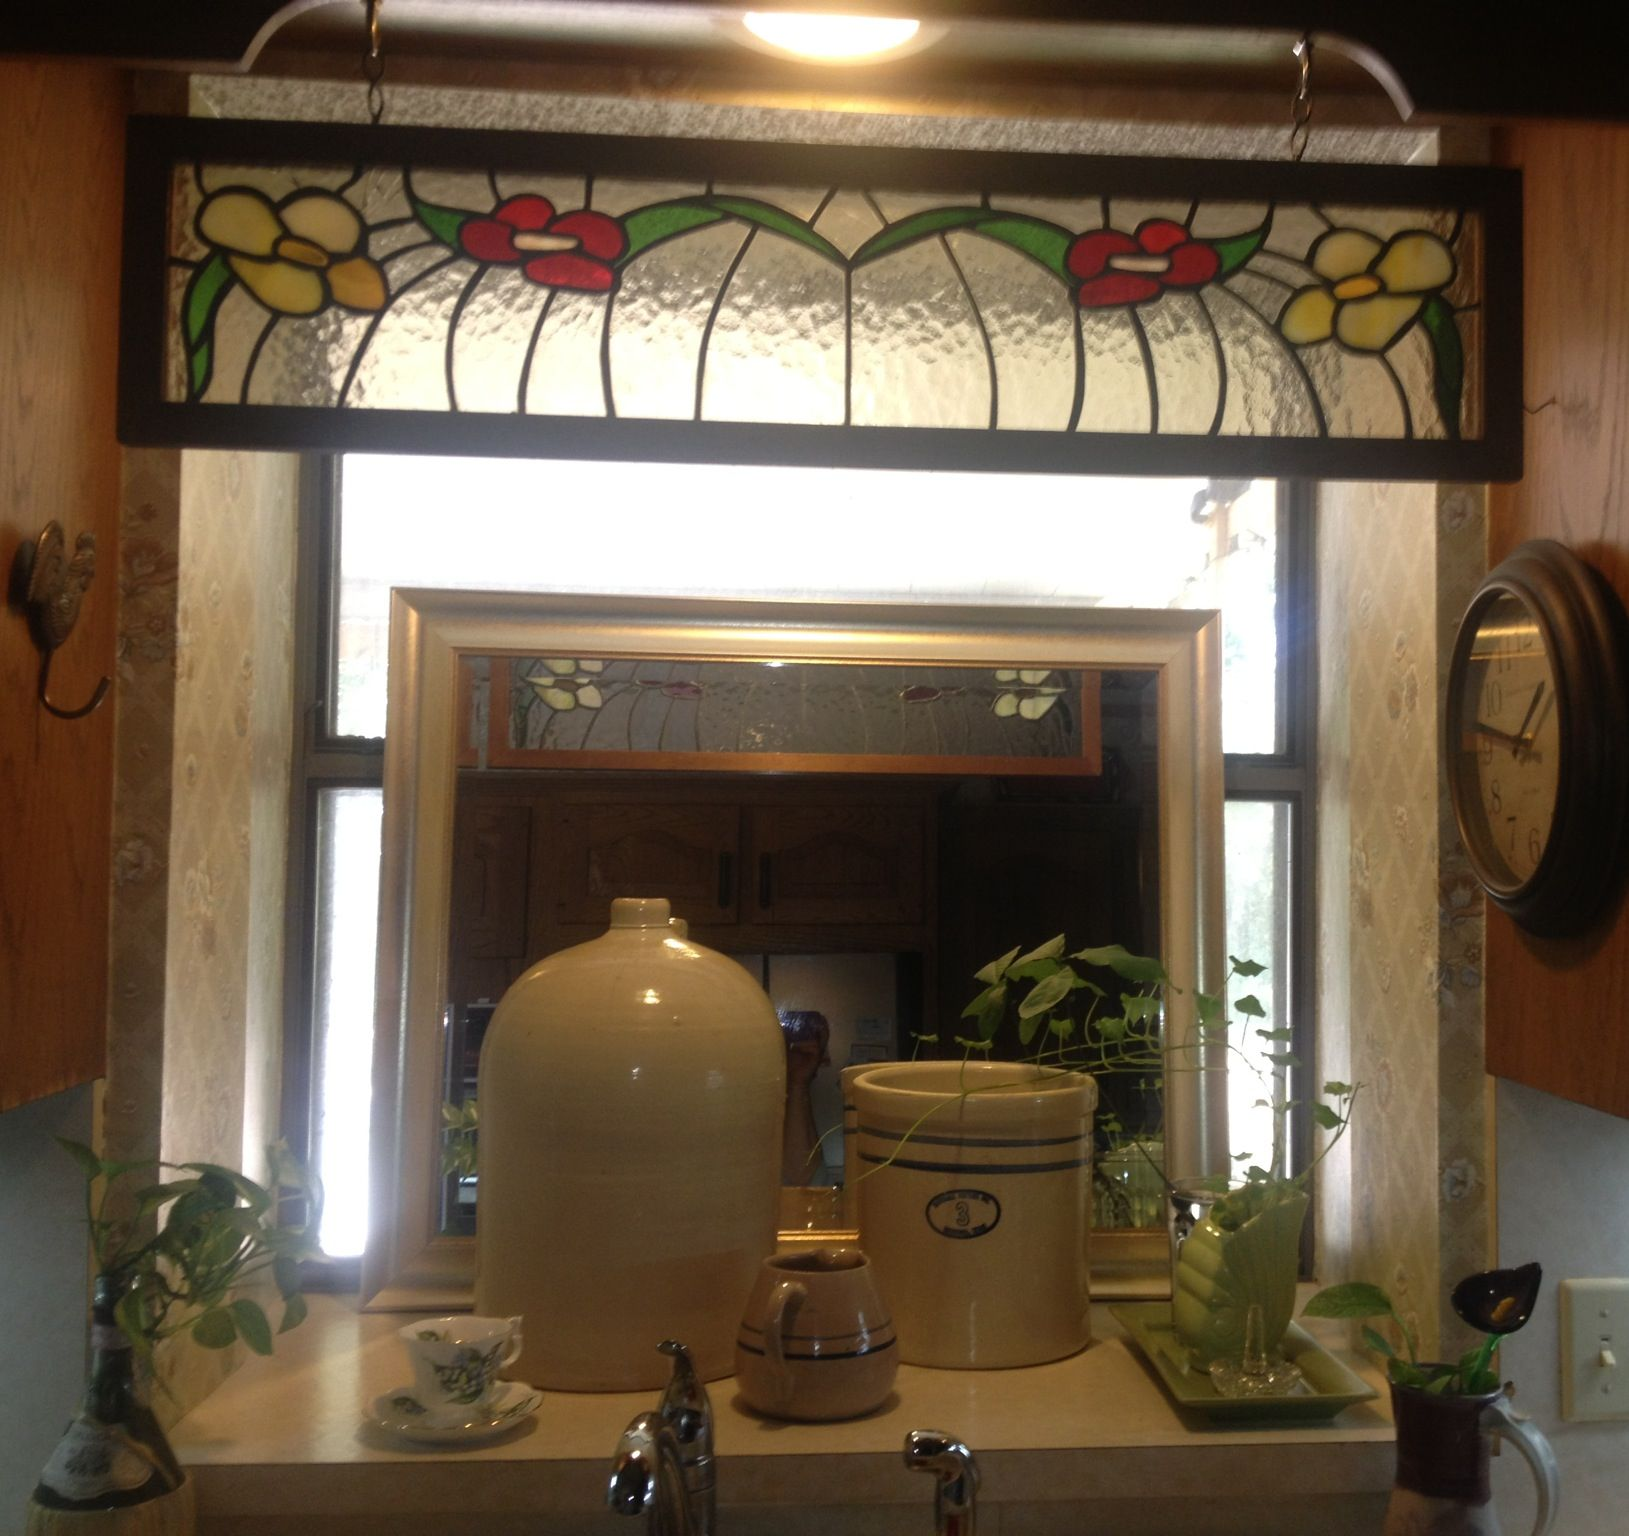 Kitchen Sink Window Curtain Ideas: Interesting Idea... Added Mirror In Kitchen Sink Window